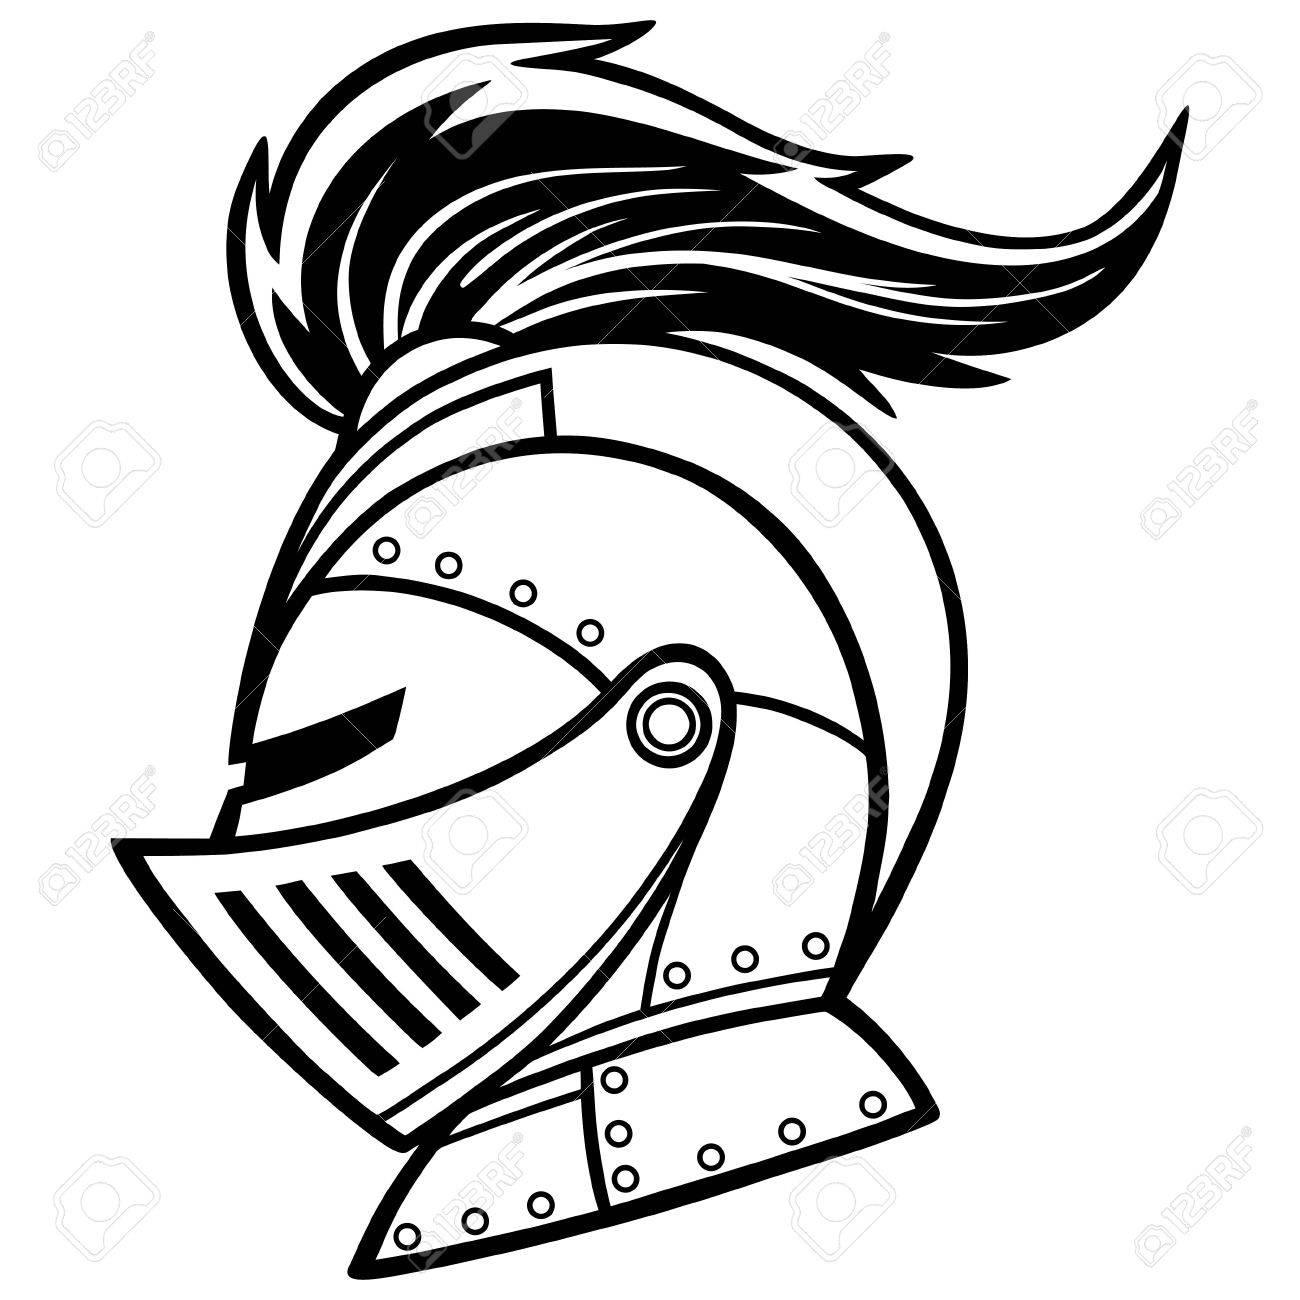 Medieval Helmet Drawing at GetDrawings.com | Free for ...